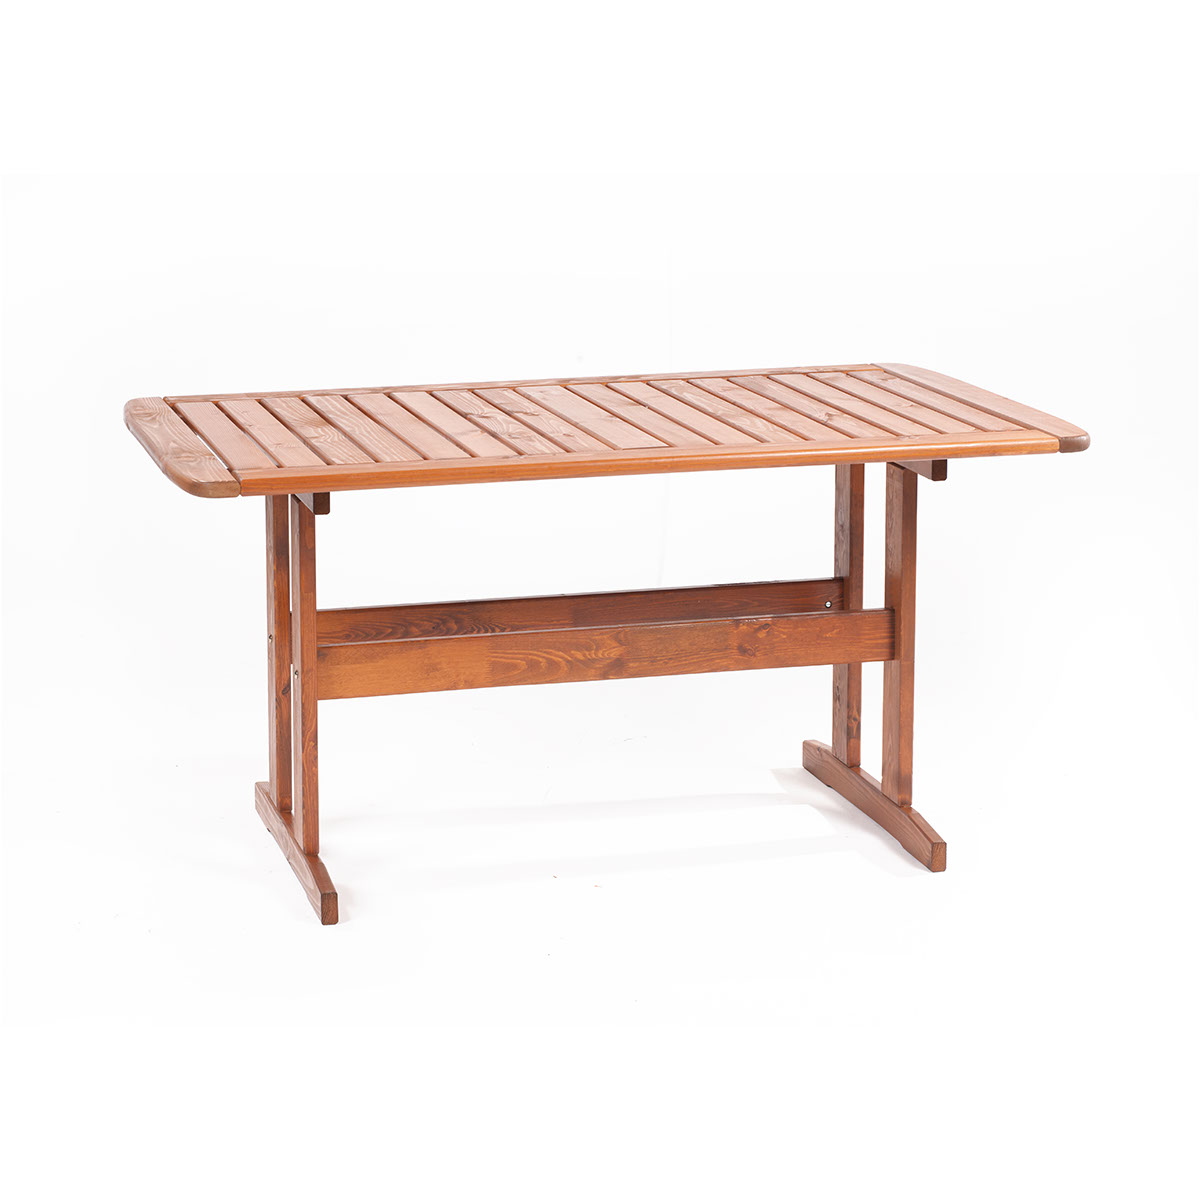 Garland Skeppsvik, zahradní stůl z borovice 150 x 88 x 73 cm